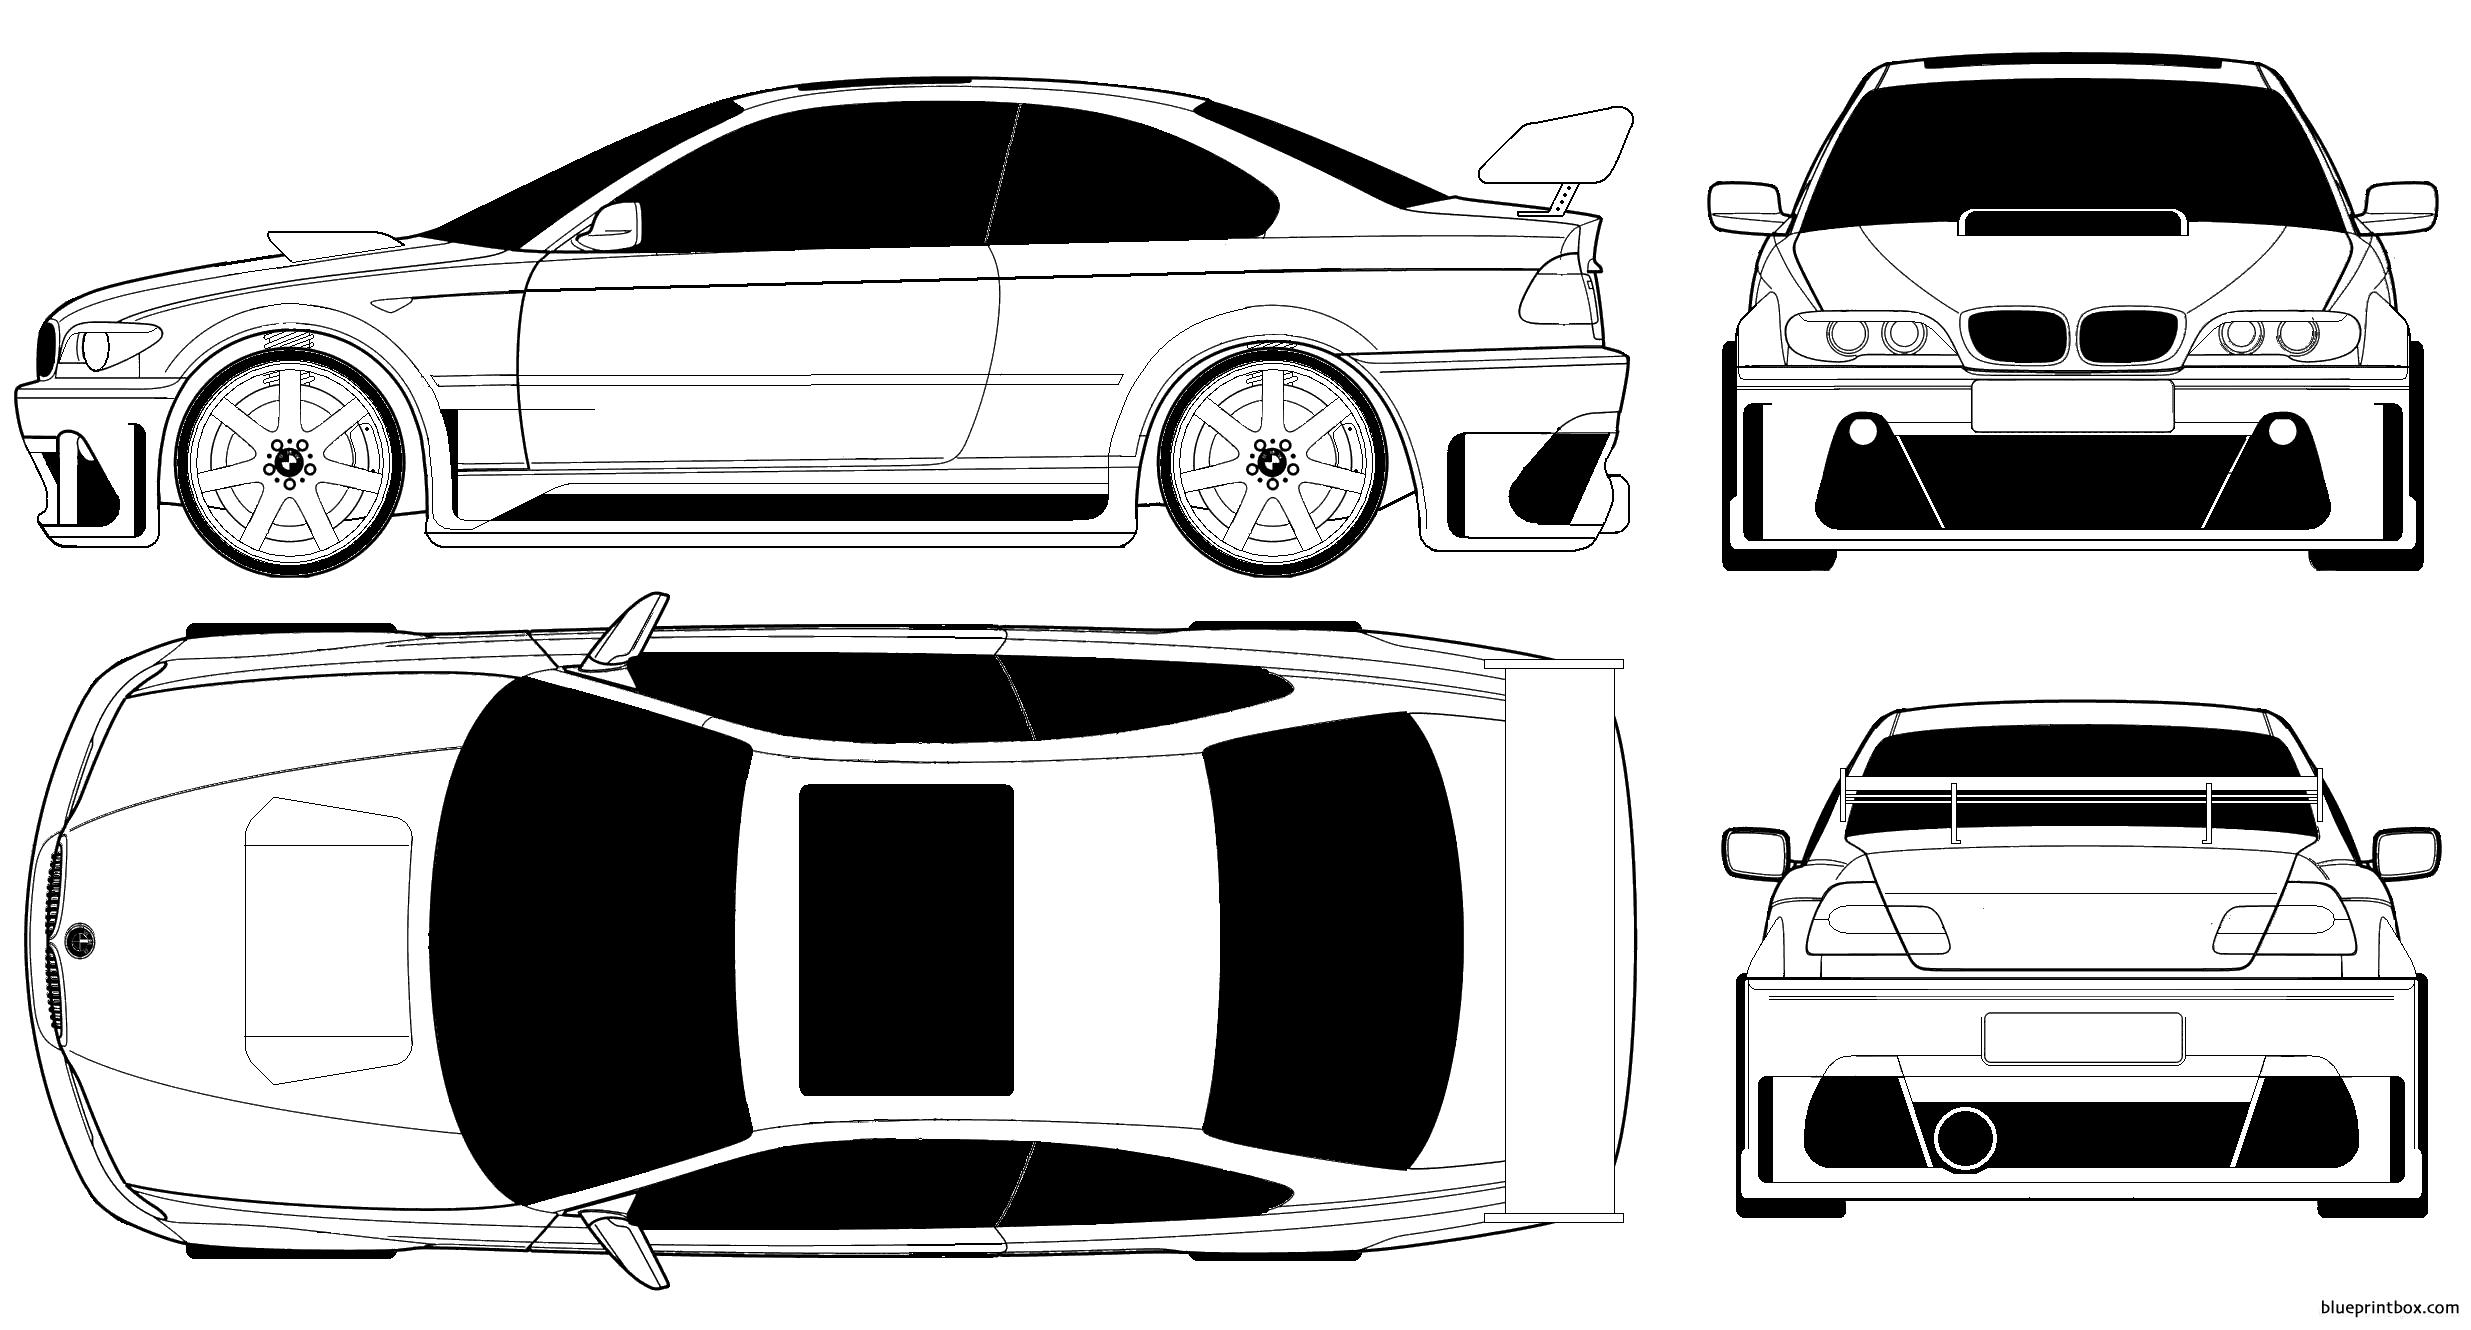 Bmw 3 Series Coupe Tuned - Blueprintbox Com